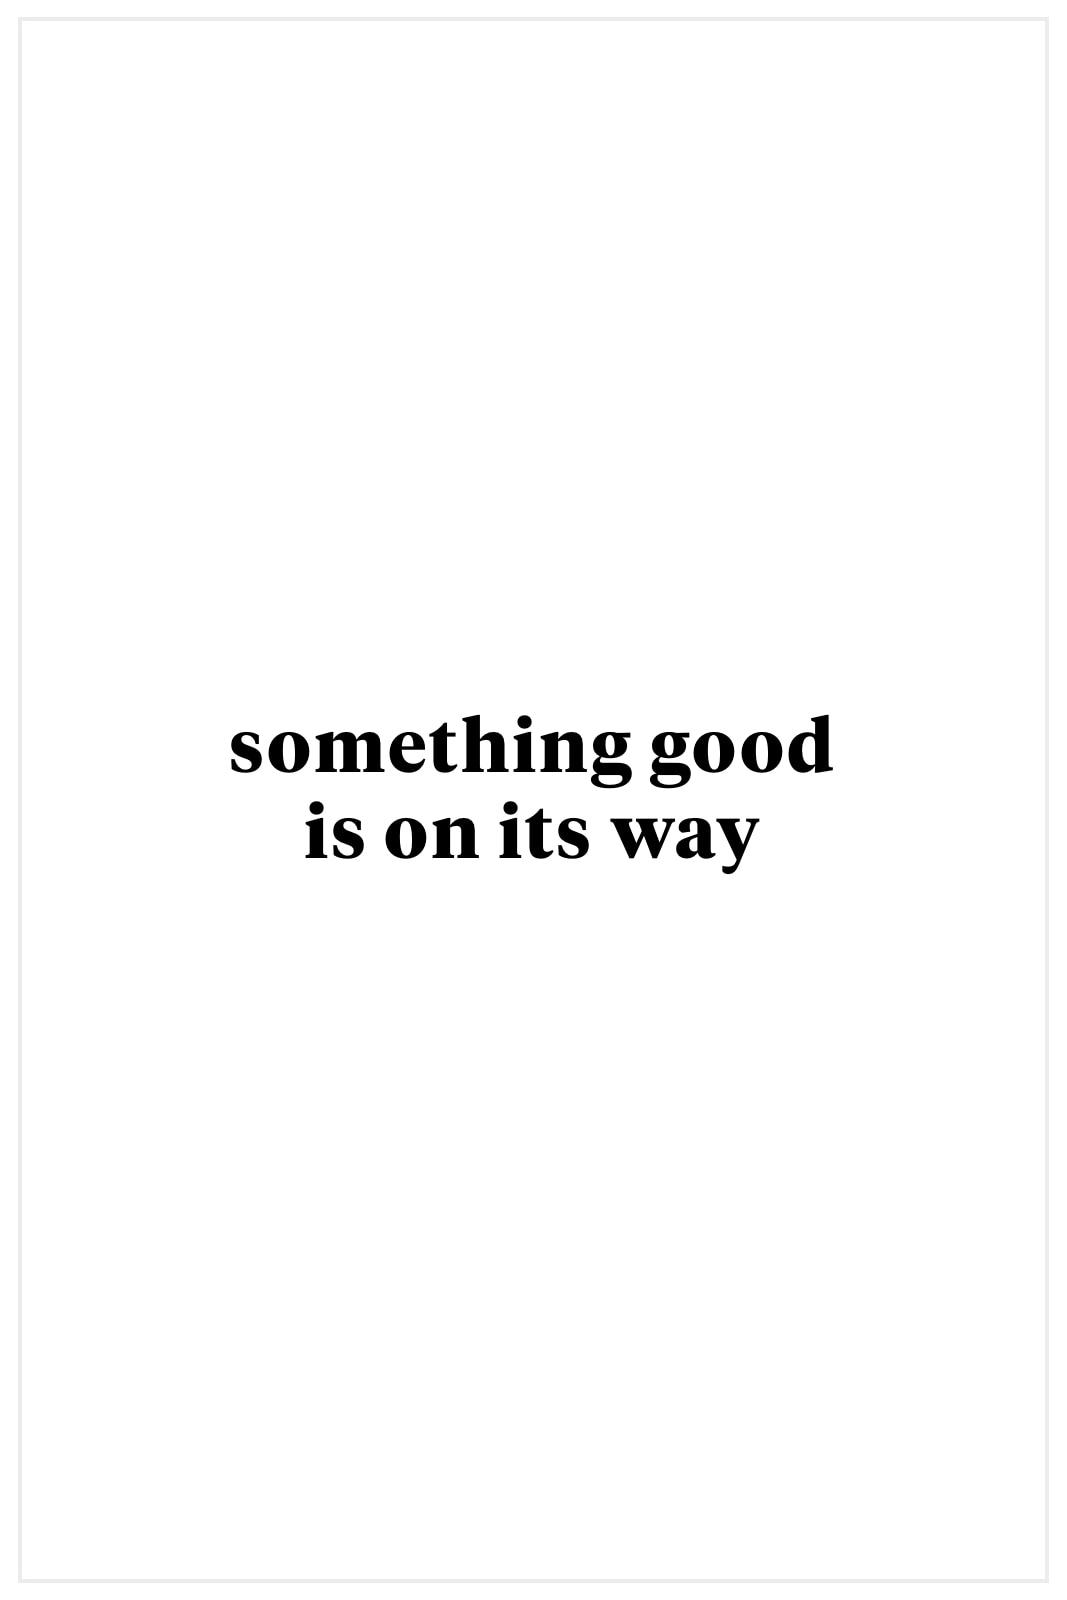 Sanctuary 3 Pk Organic Cotton Mask with Filter Pocket